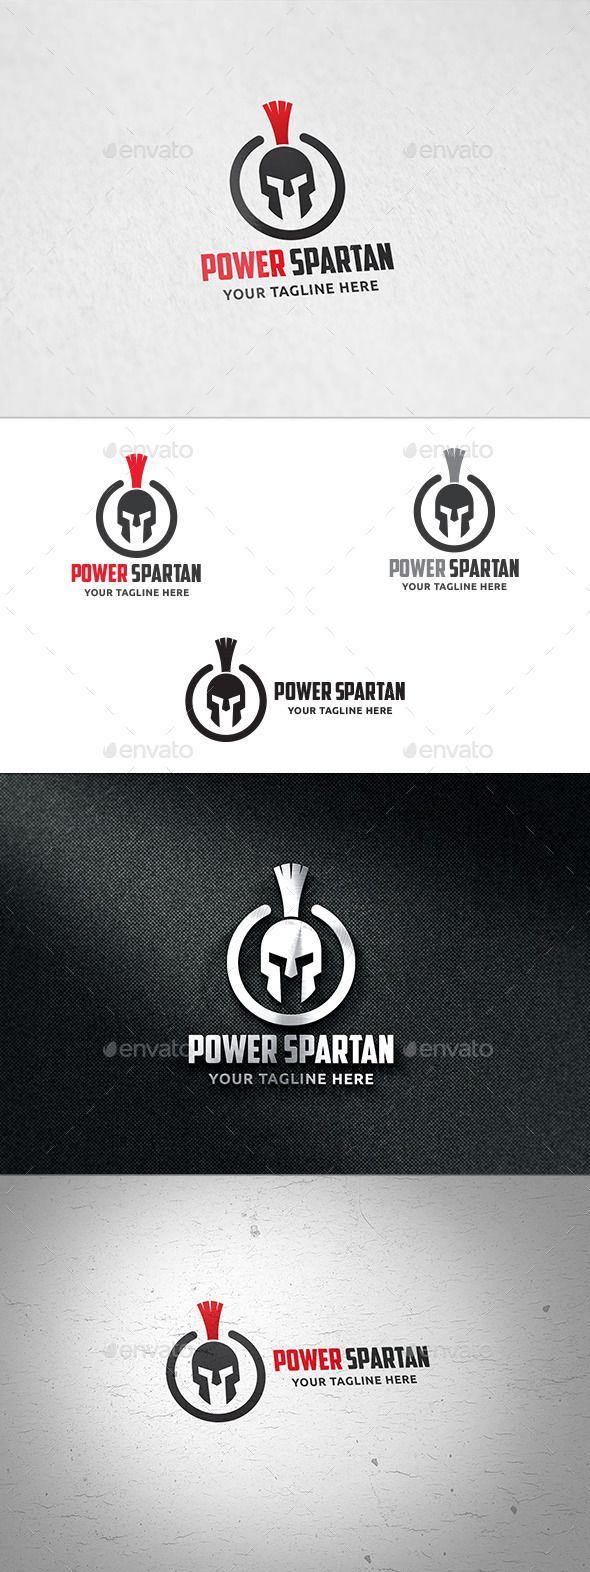 Power Spartan - Logo Template Vector EPS, AI. Download here: http://graphicriver.net/item/power-spartan-logo-template/12404719?ref=ksioks